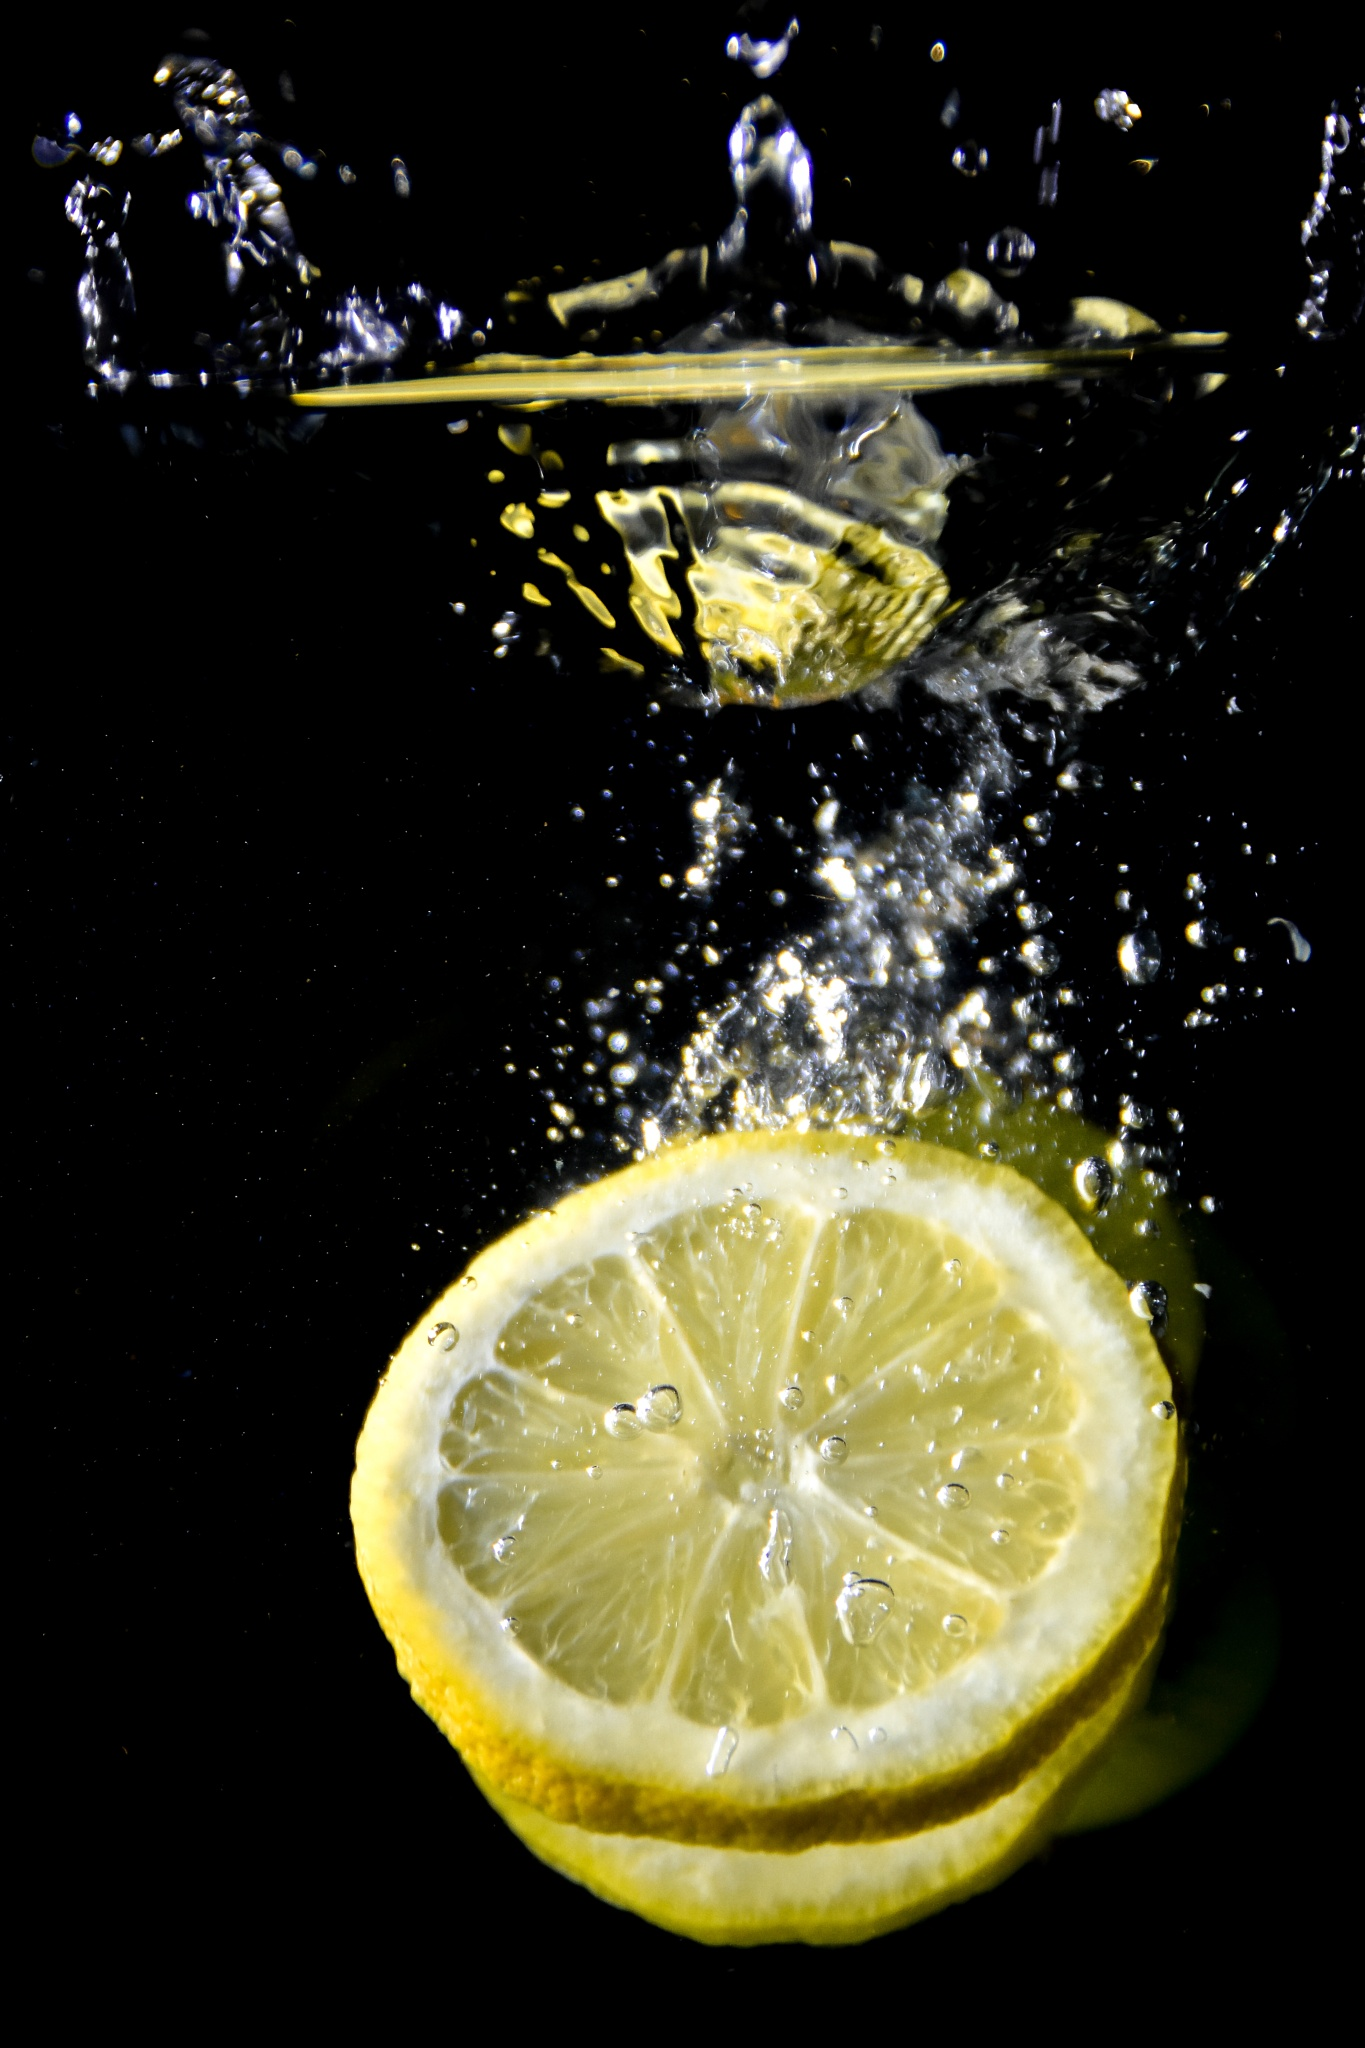 Lemon splash by Kristof Maenhout